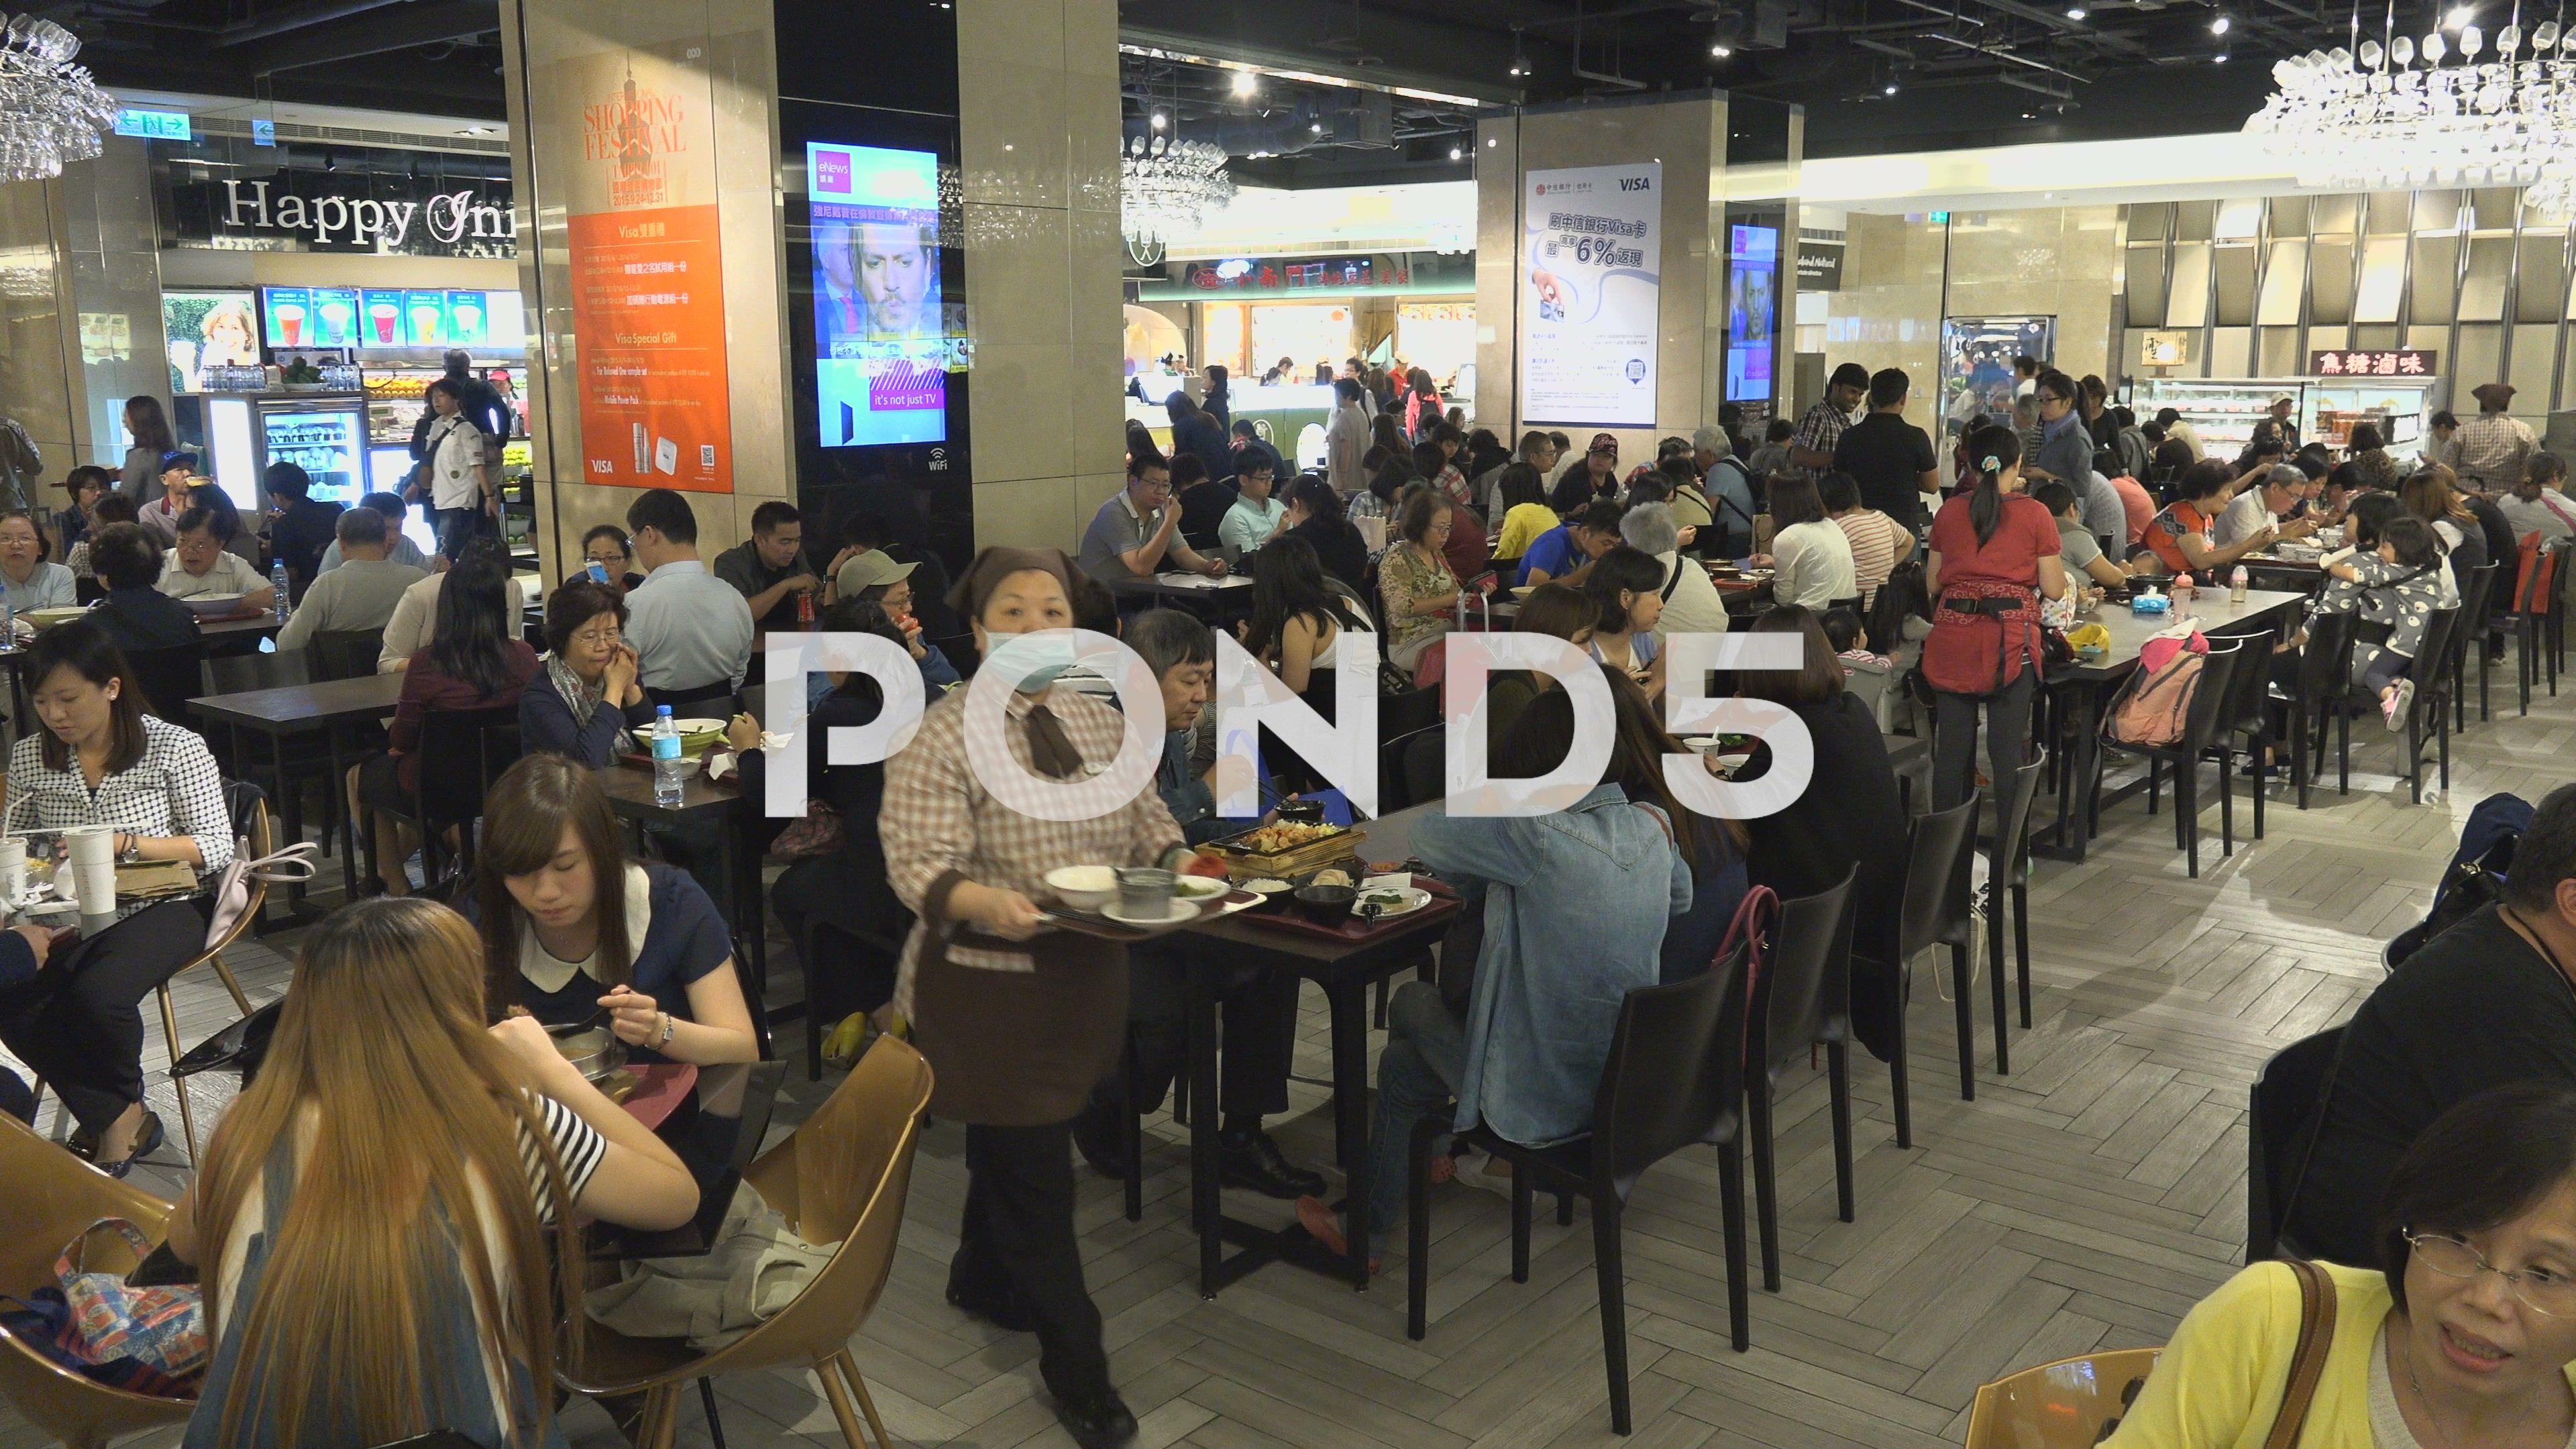 Asian food busy popular restaurant modern food court